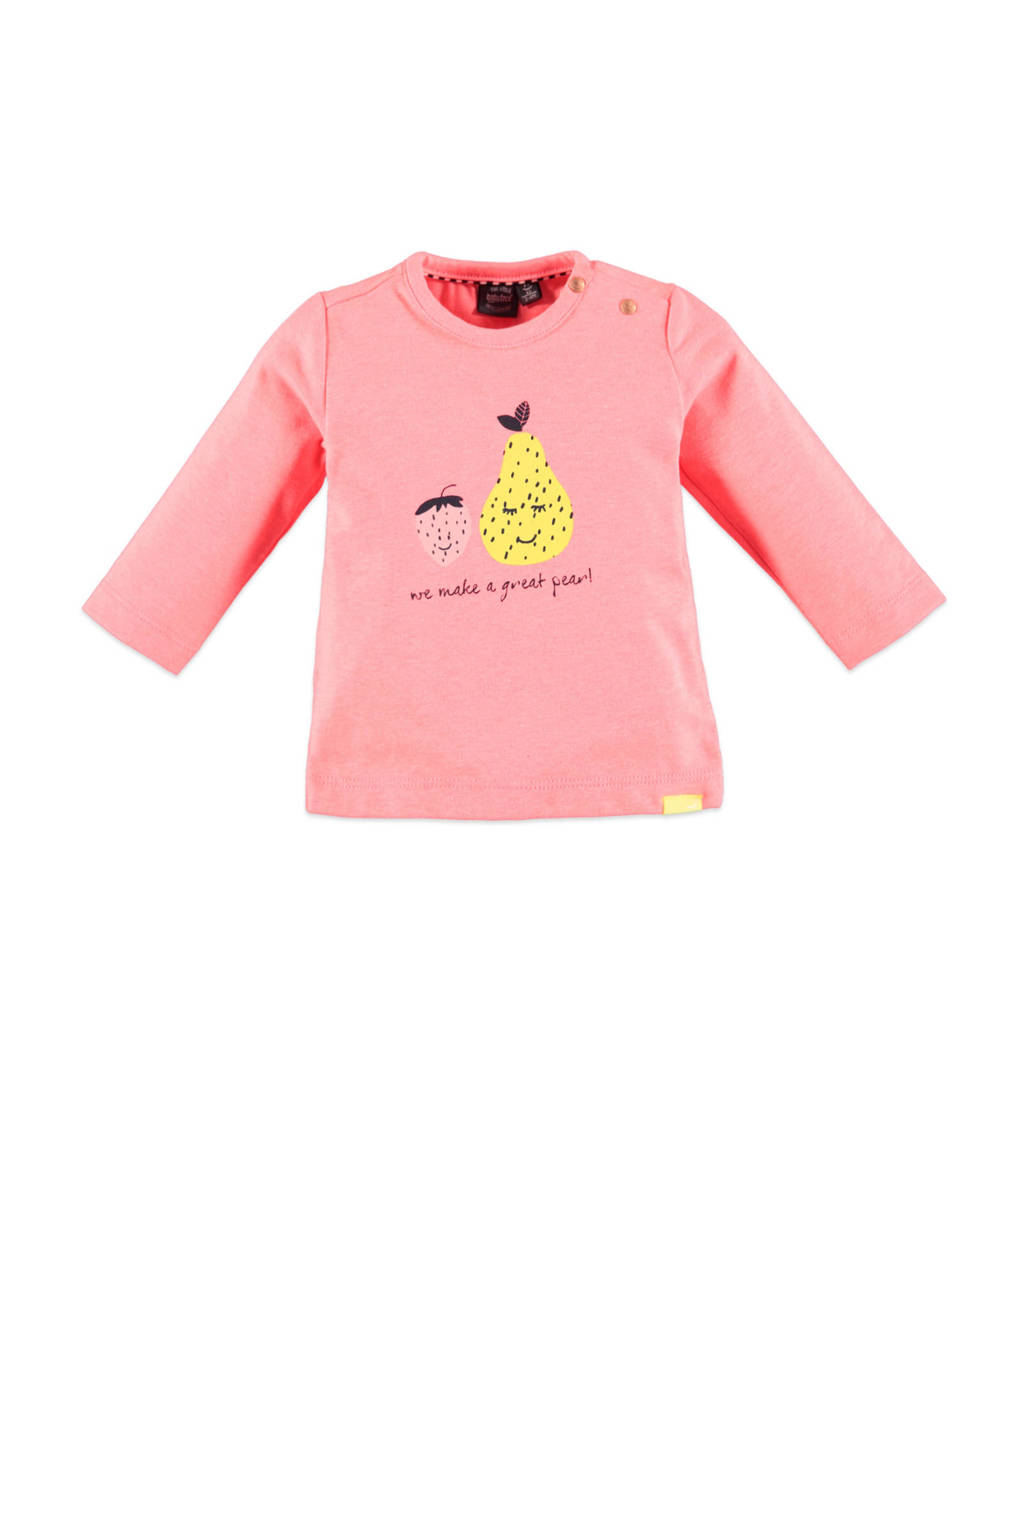 Babyface baby longsleeve met printopdruk roze/geel/zwart, Roze/geel/zwart